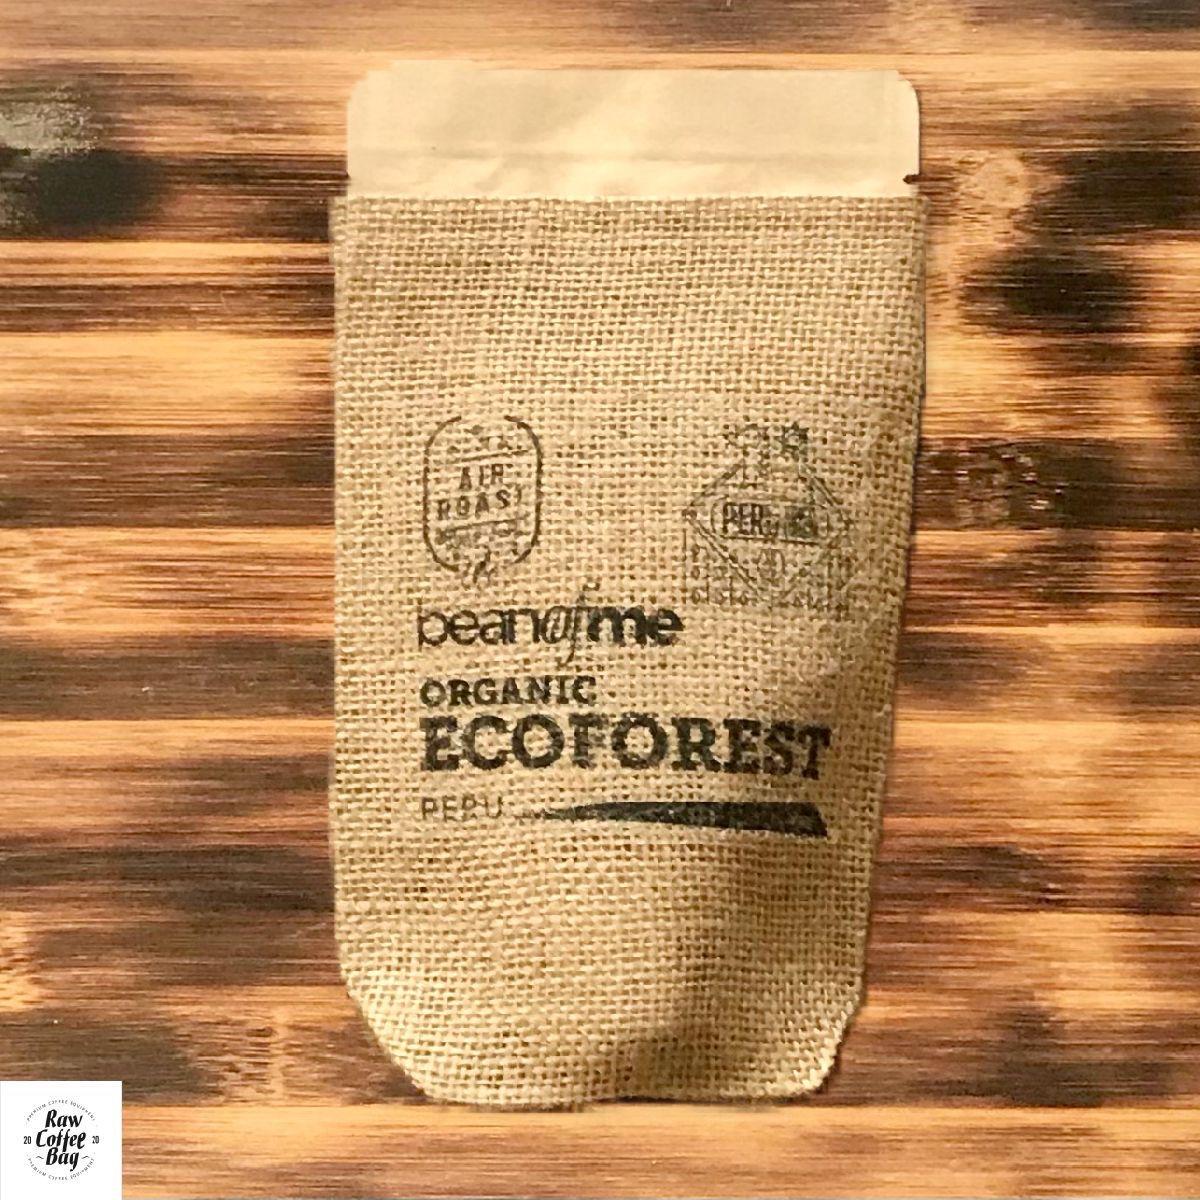 Beanofme Peru Ecoforest